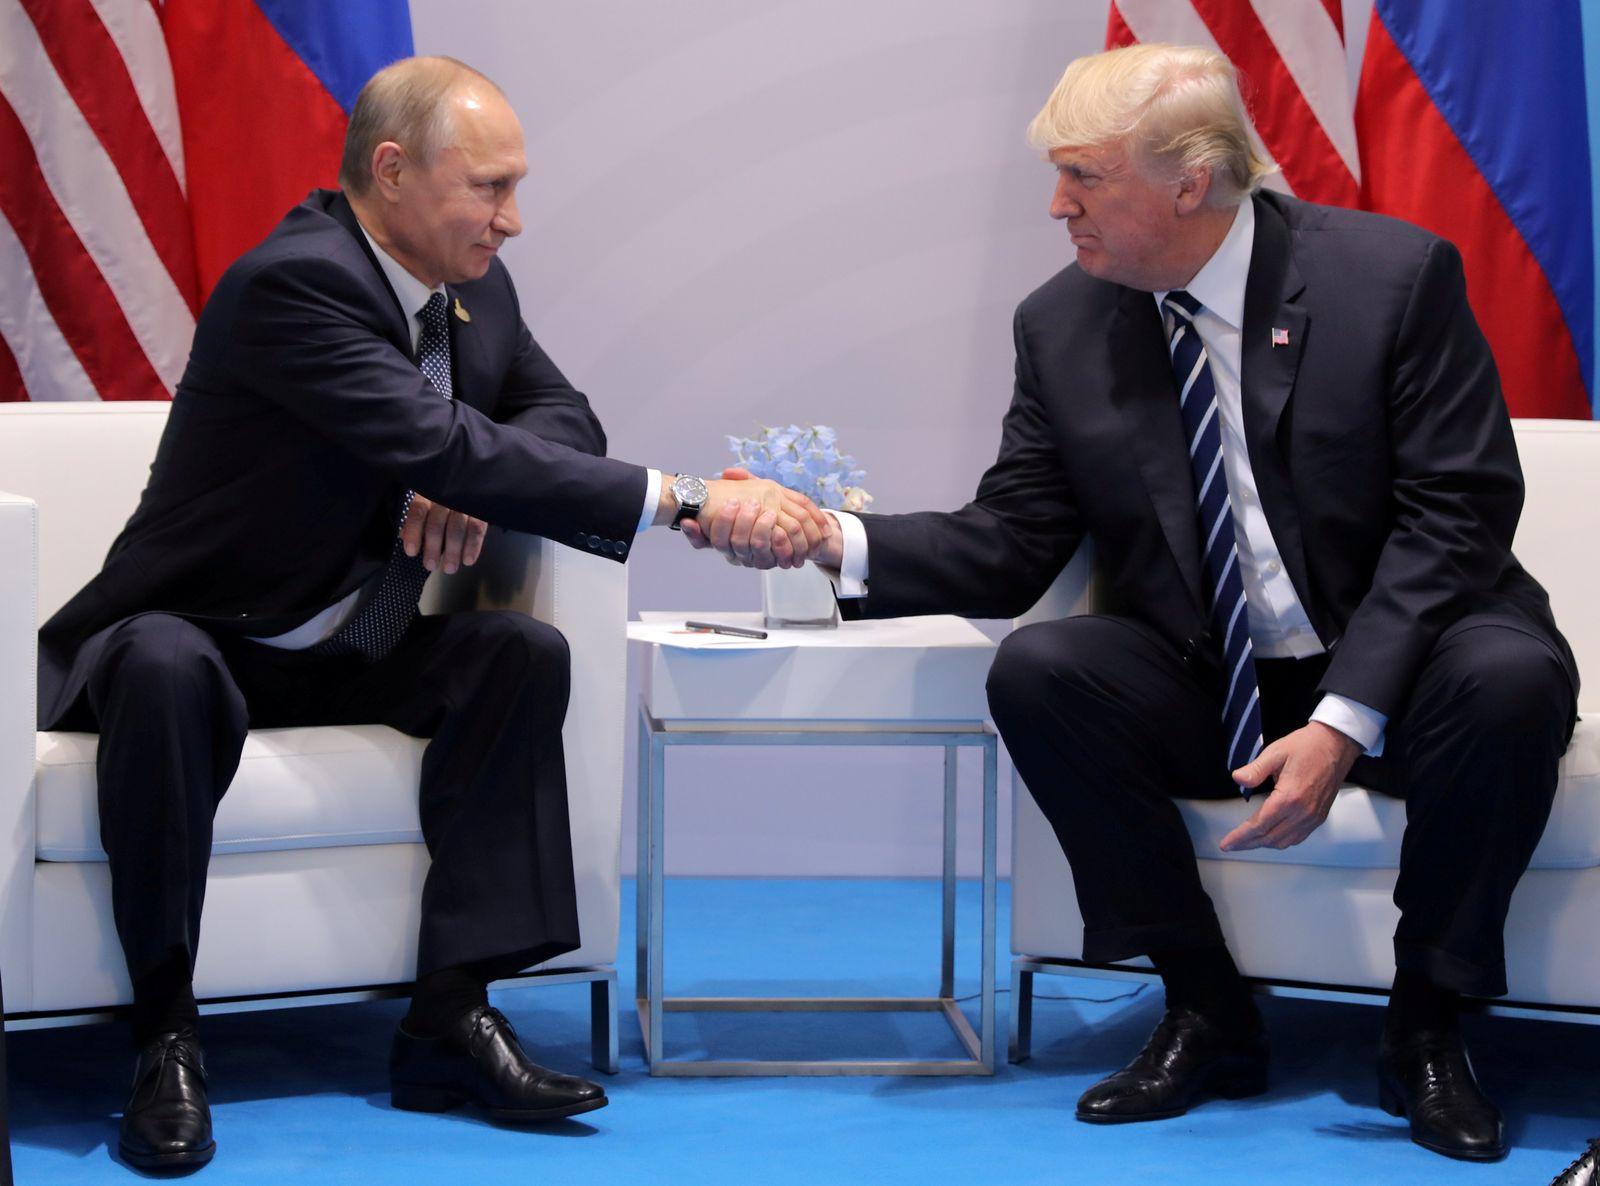 Trump/ Putin/ G20